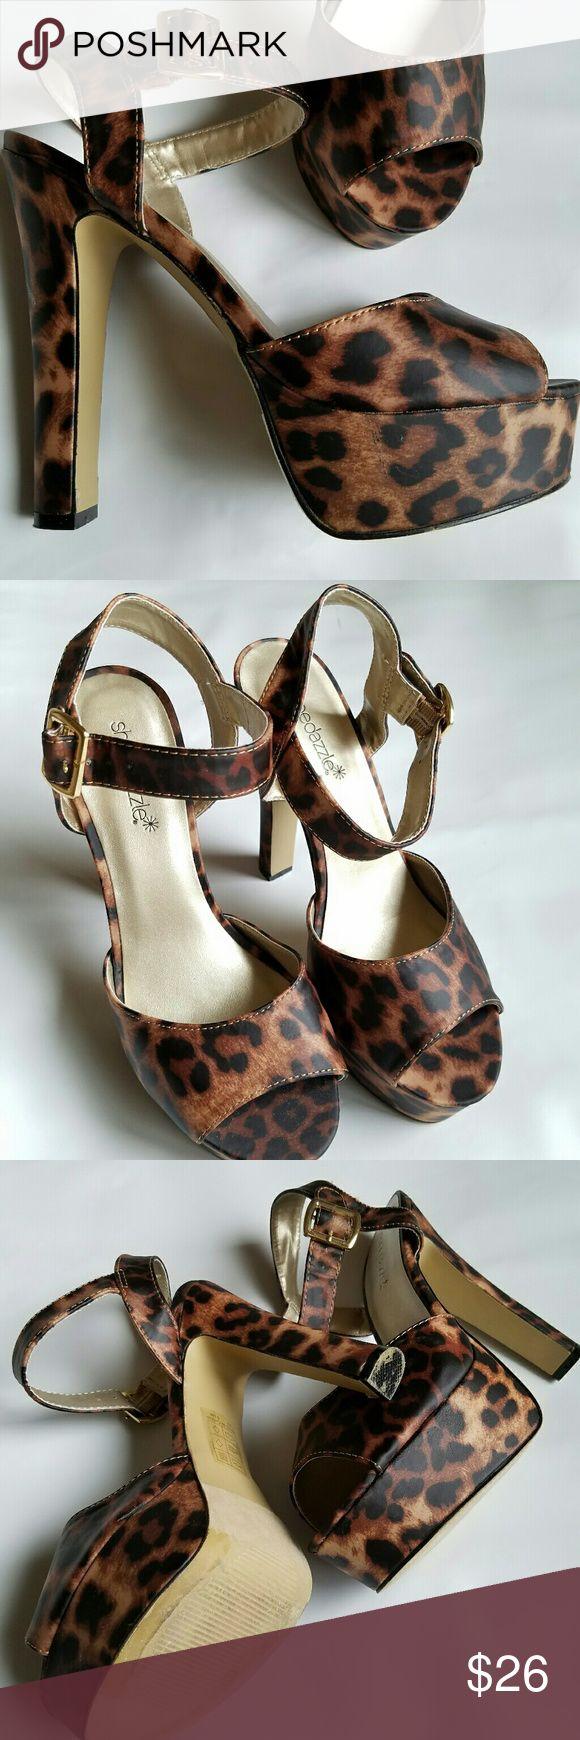 Shoe Dazzle Leopard Print High Heel Sandal Size 7 Shoe Dazzle Leopard Print High Heel Sandal in great condition, close to new. Shoe Dazzle Shoes Heels